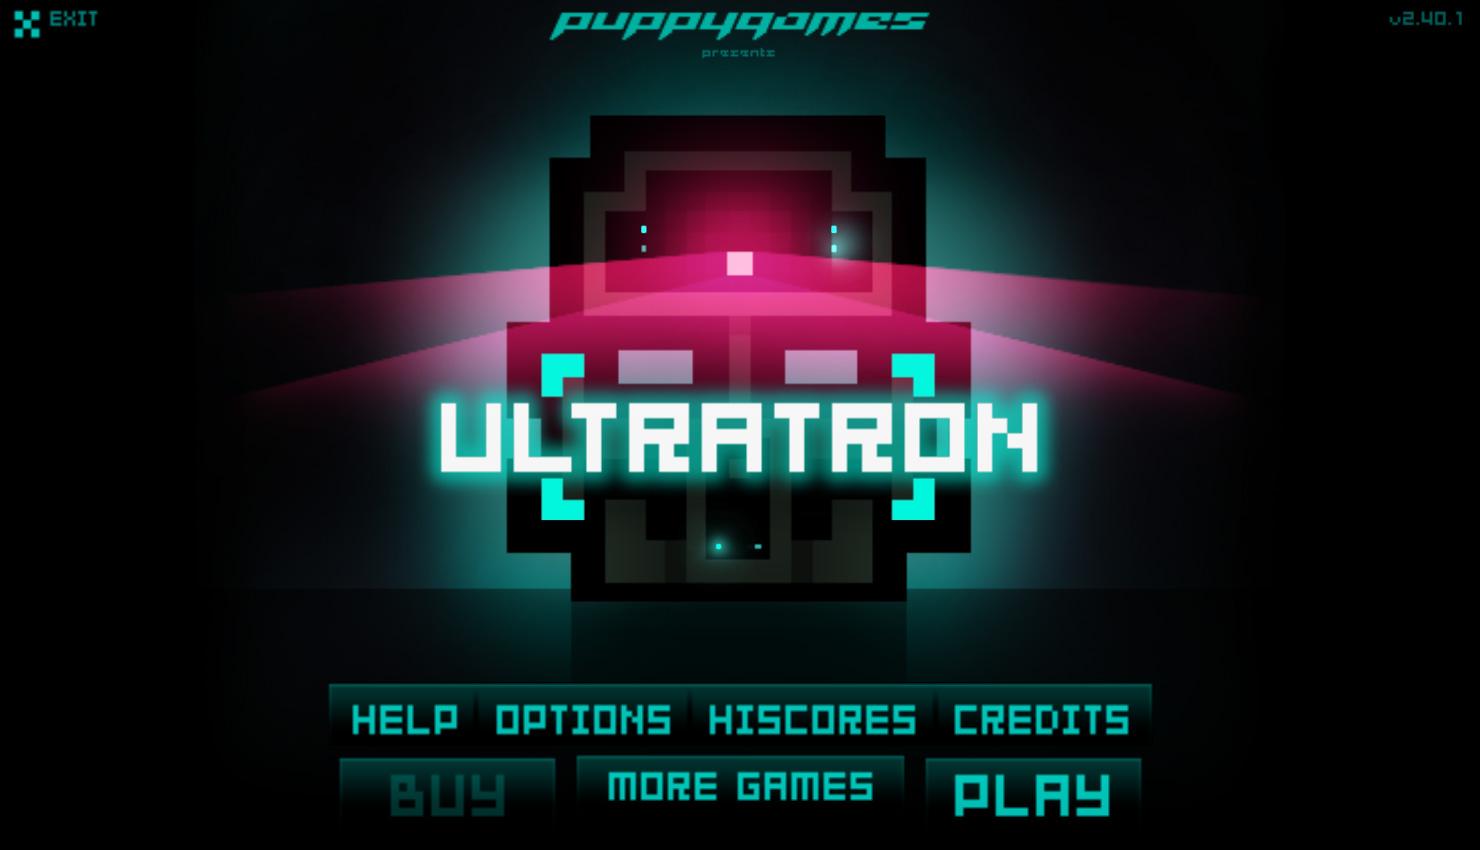 Ultratron steam key giveaways